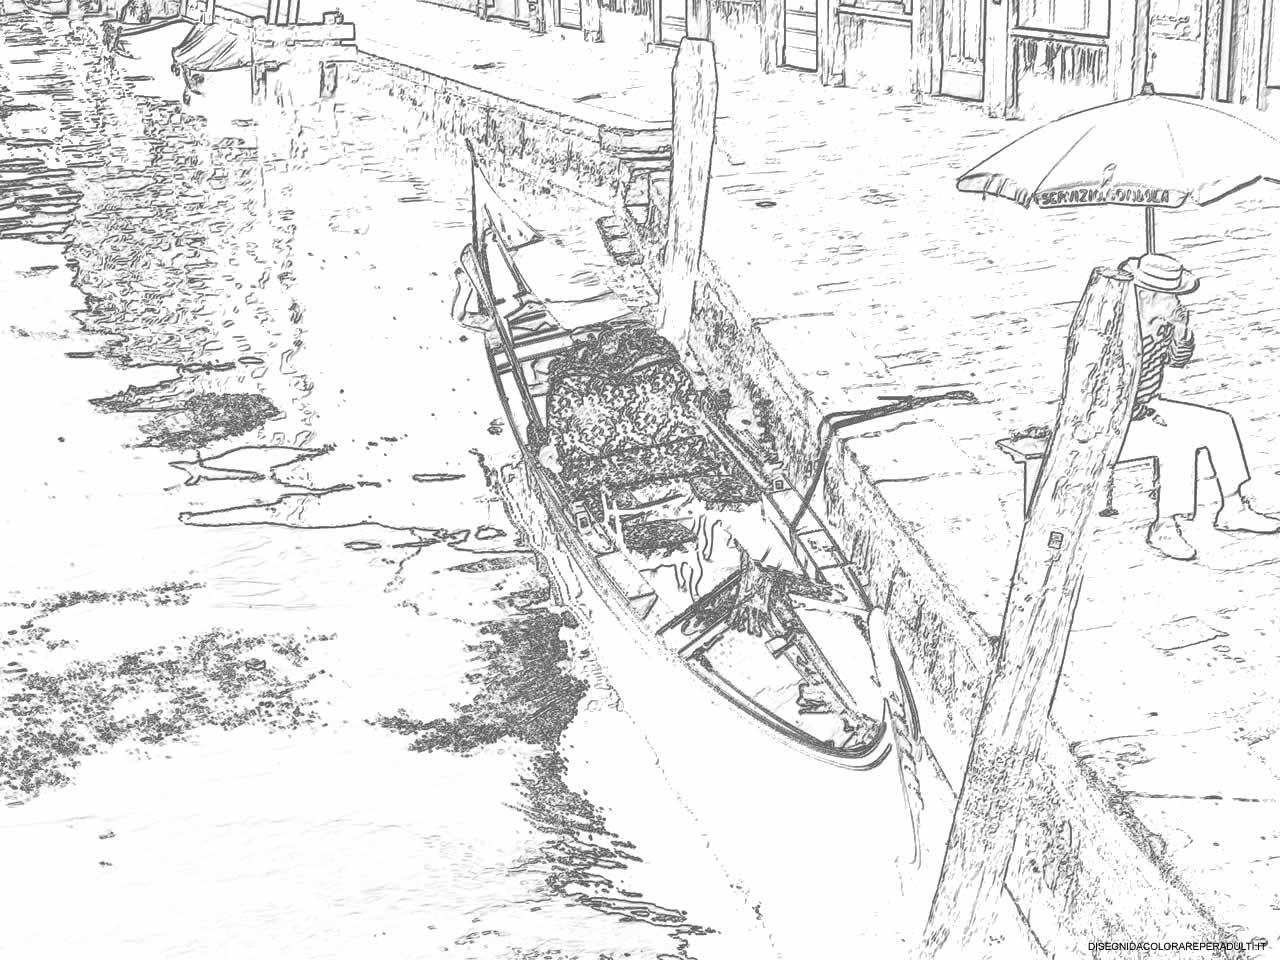 1280x960 Gondola E Gondoliere Drawings Of Venice